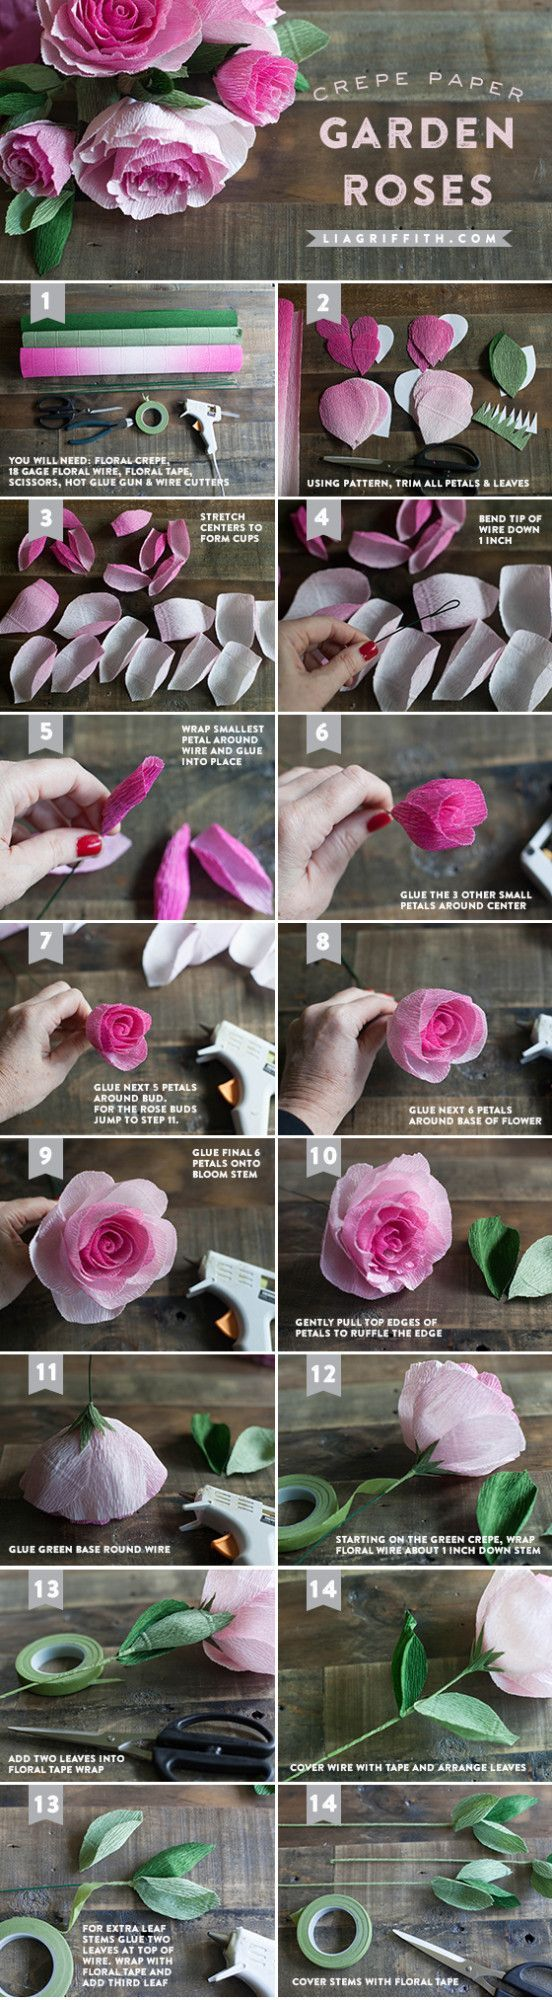 DIY Crepe Paper Ombré Garden Roses - http://liagriffith.com/diy-crepe-paper-ombre-garden-roses/